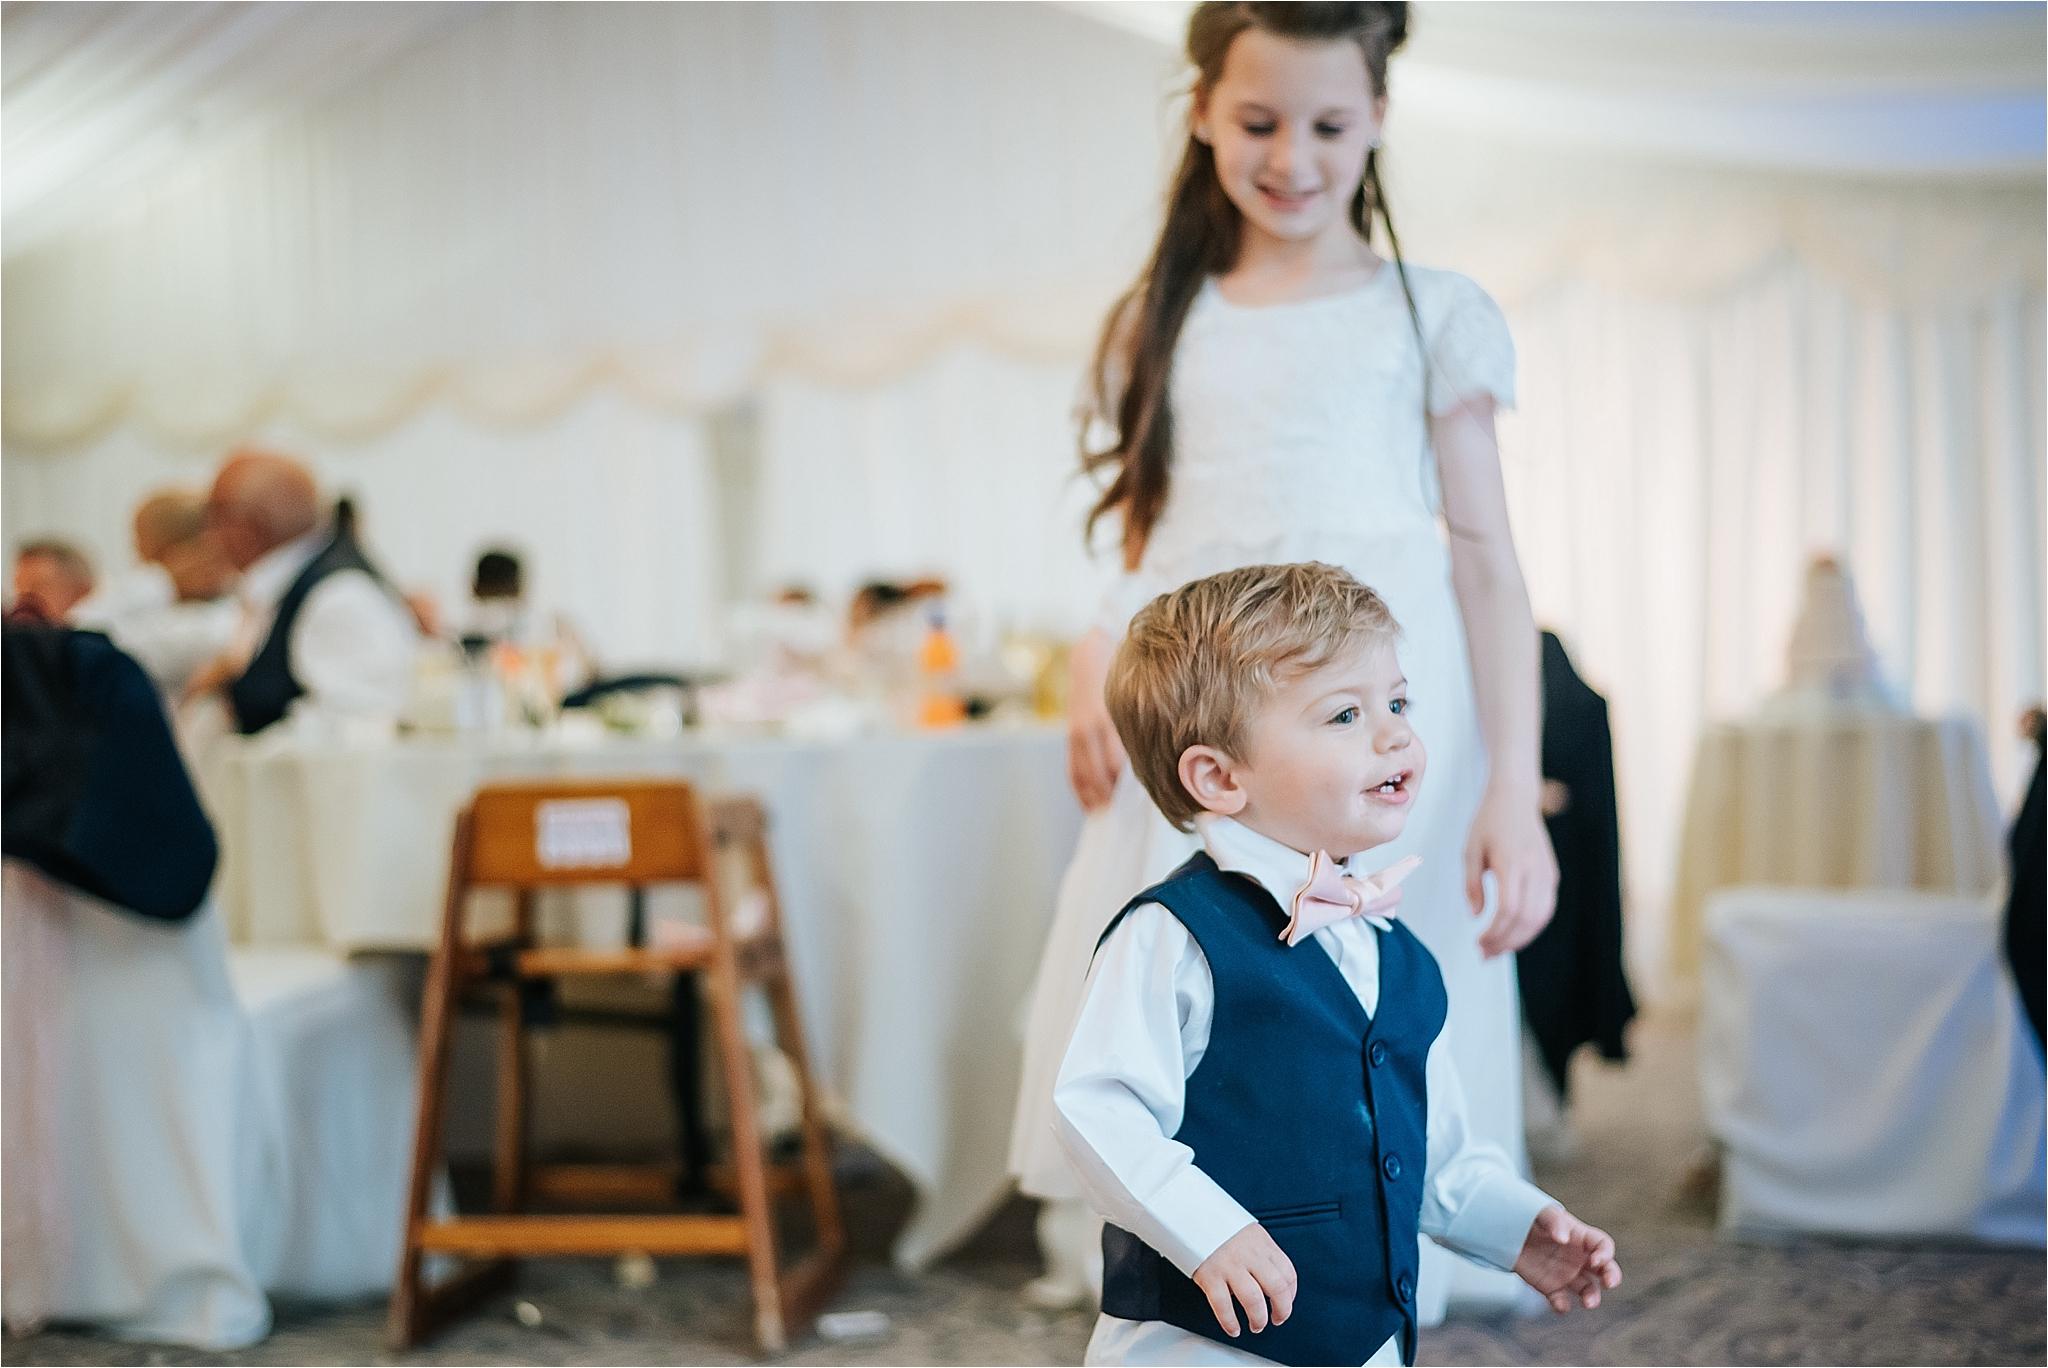 thevilla+lancashire+wreagreen+wedding+photographer45.jpg